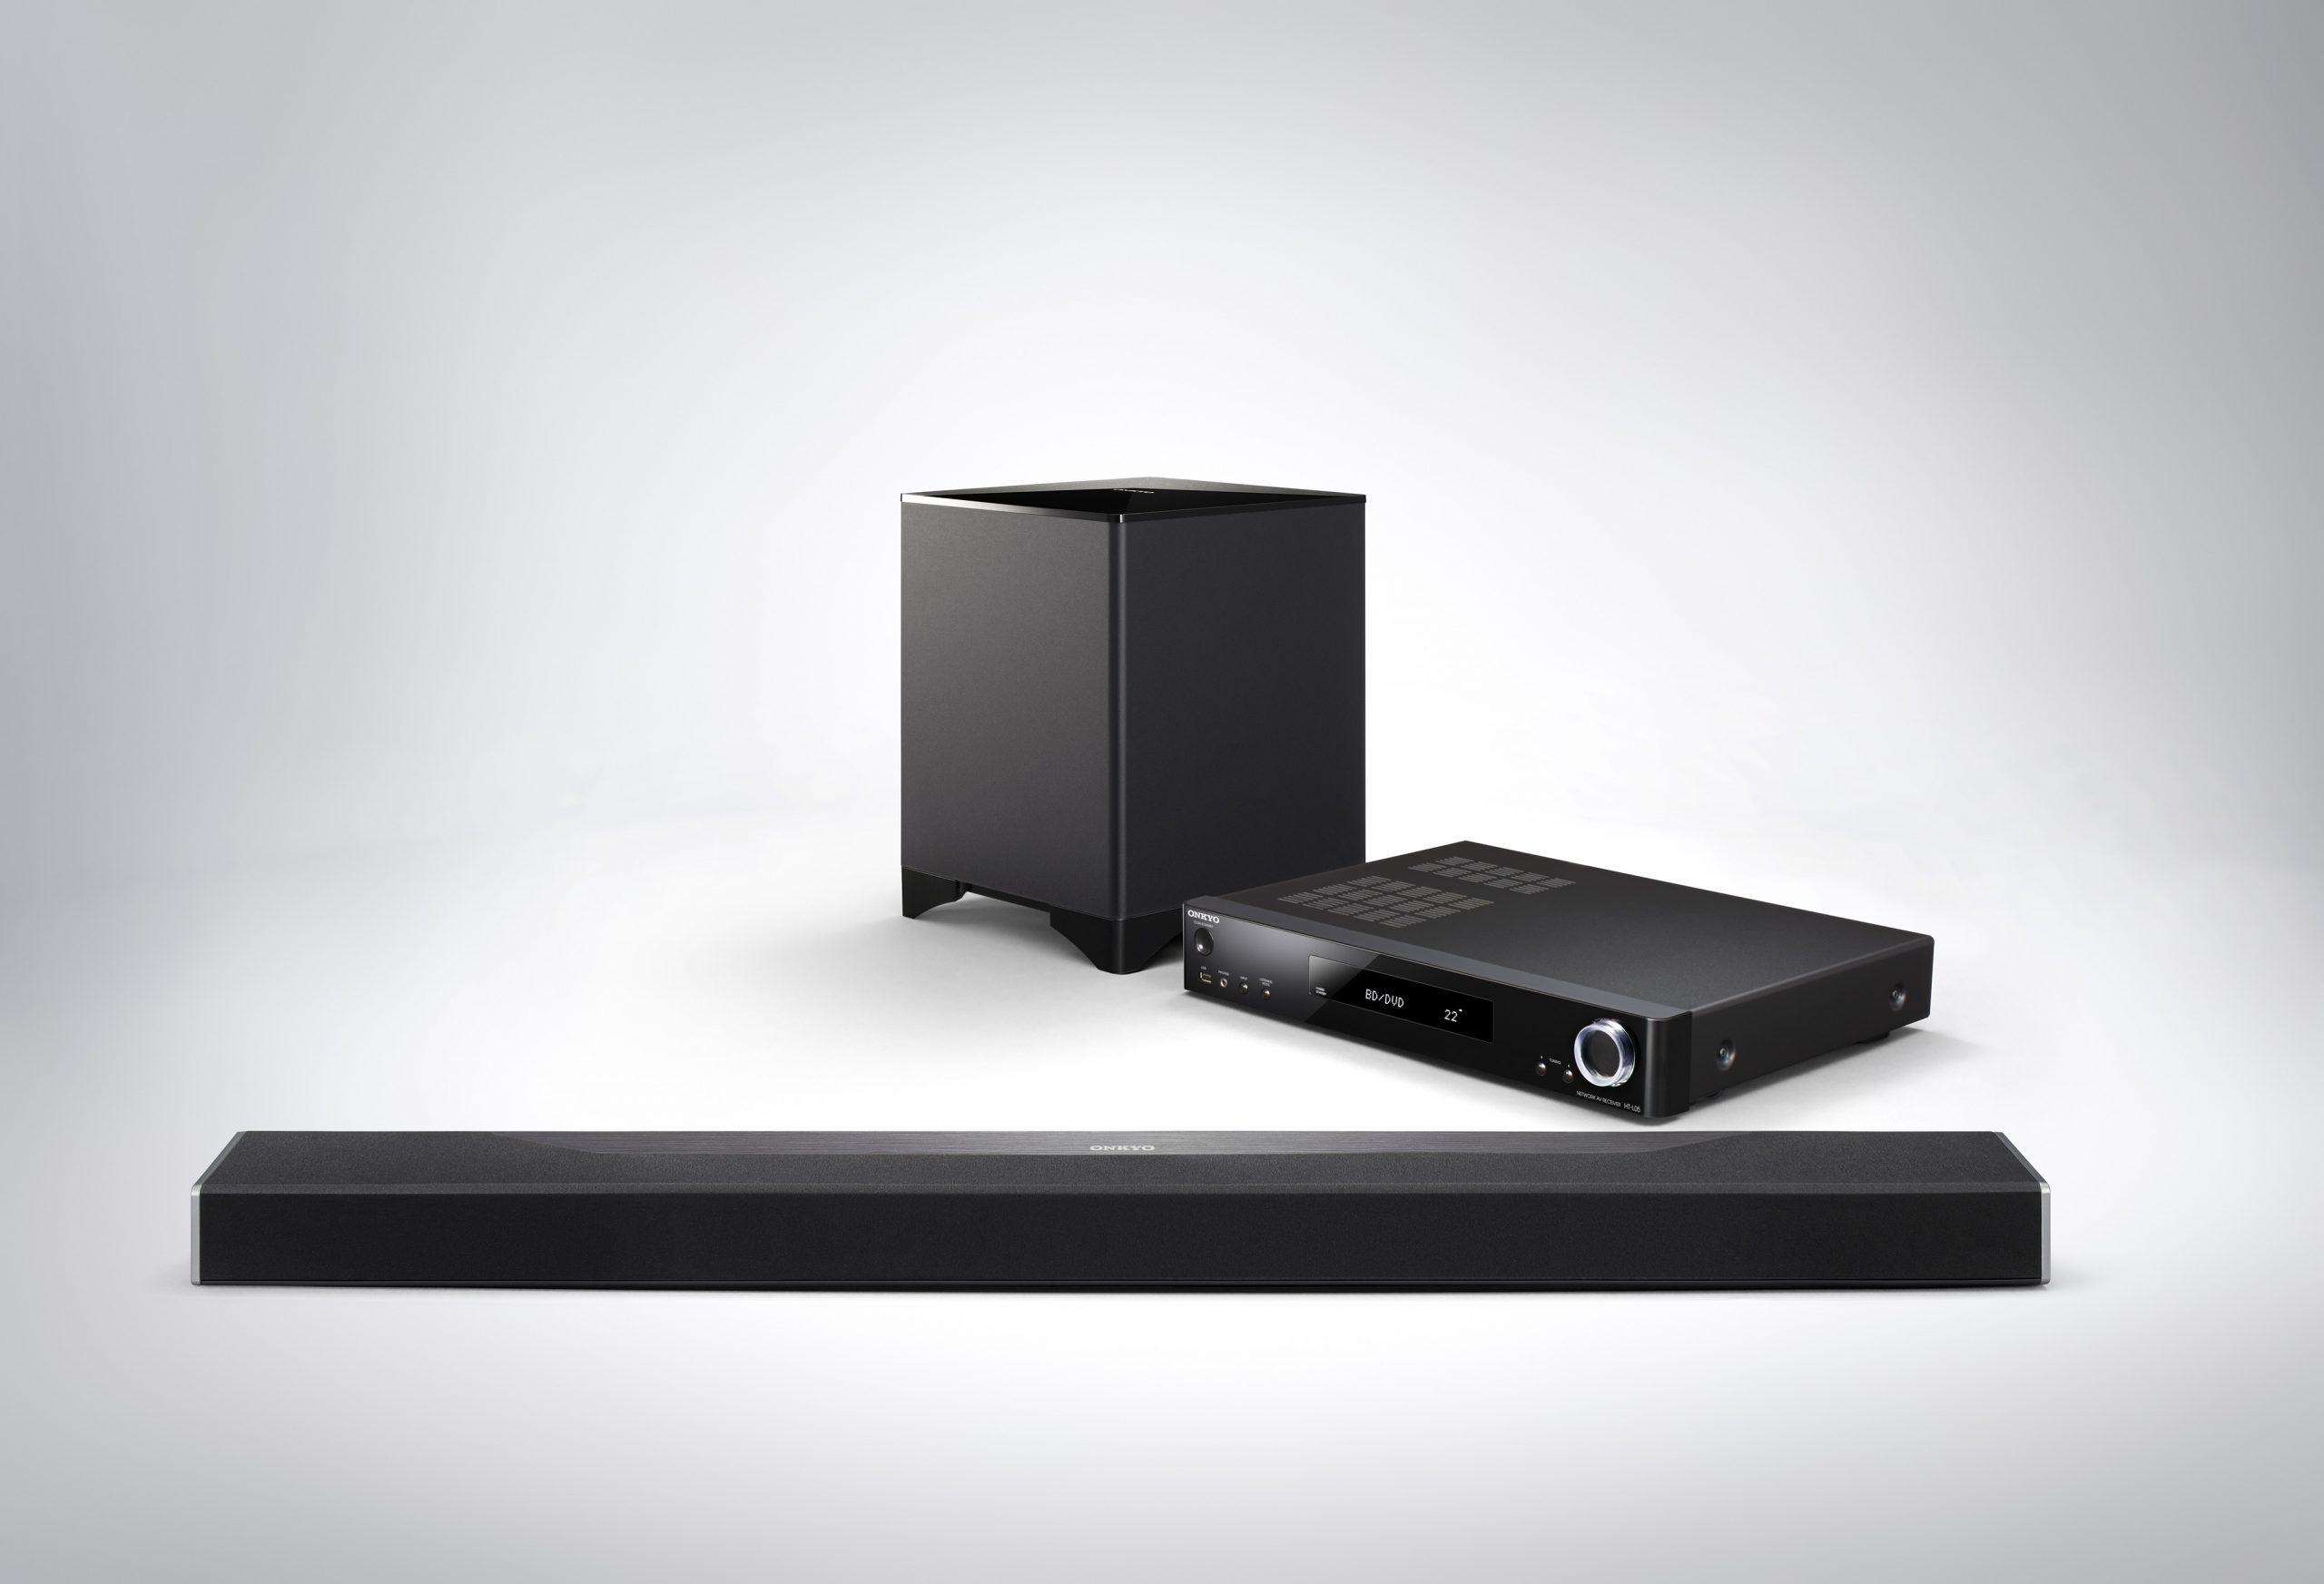 Pioneer and Onkyo Release Dolby Atmos Soundbars